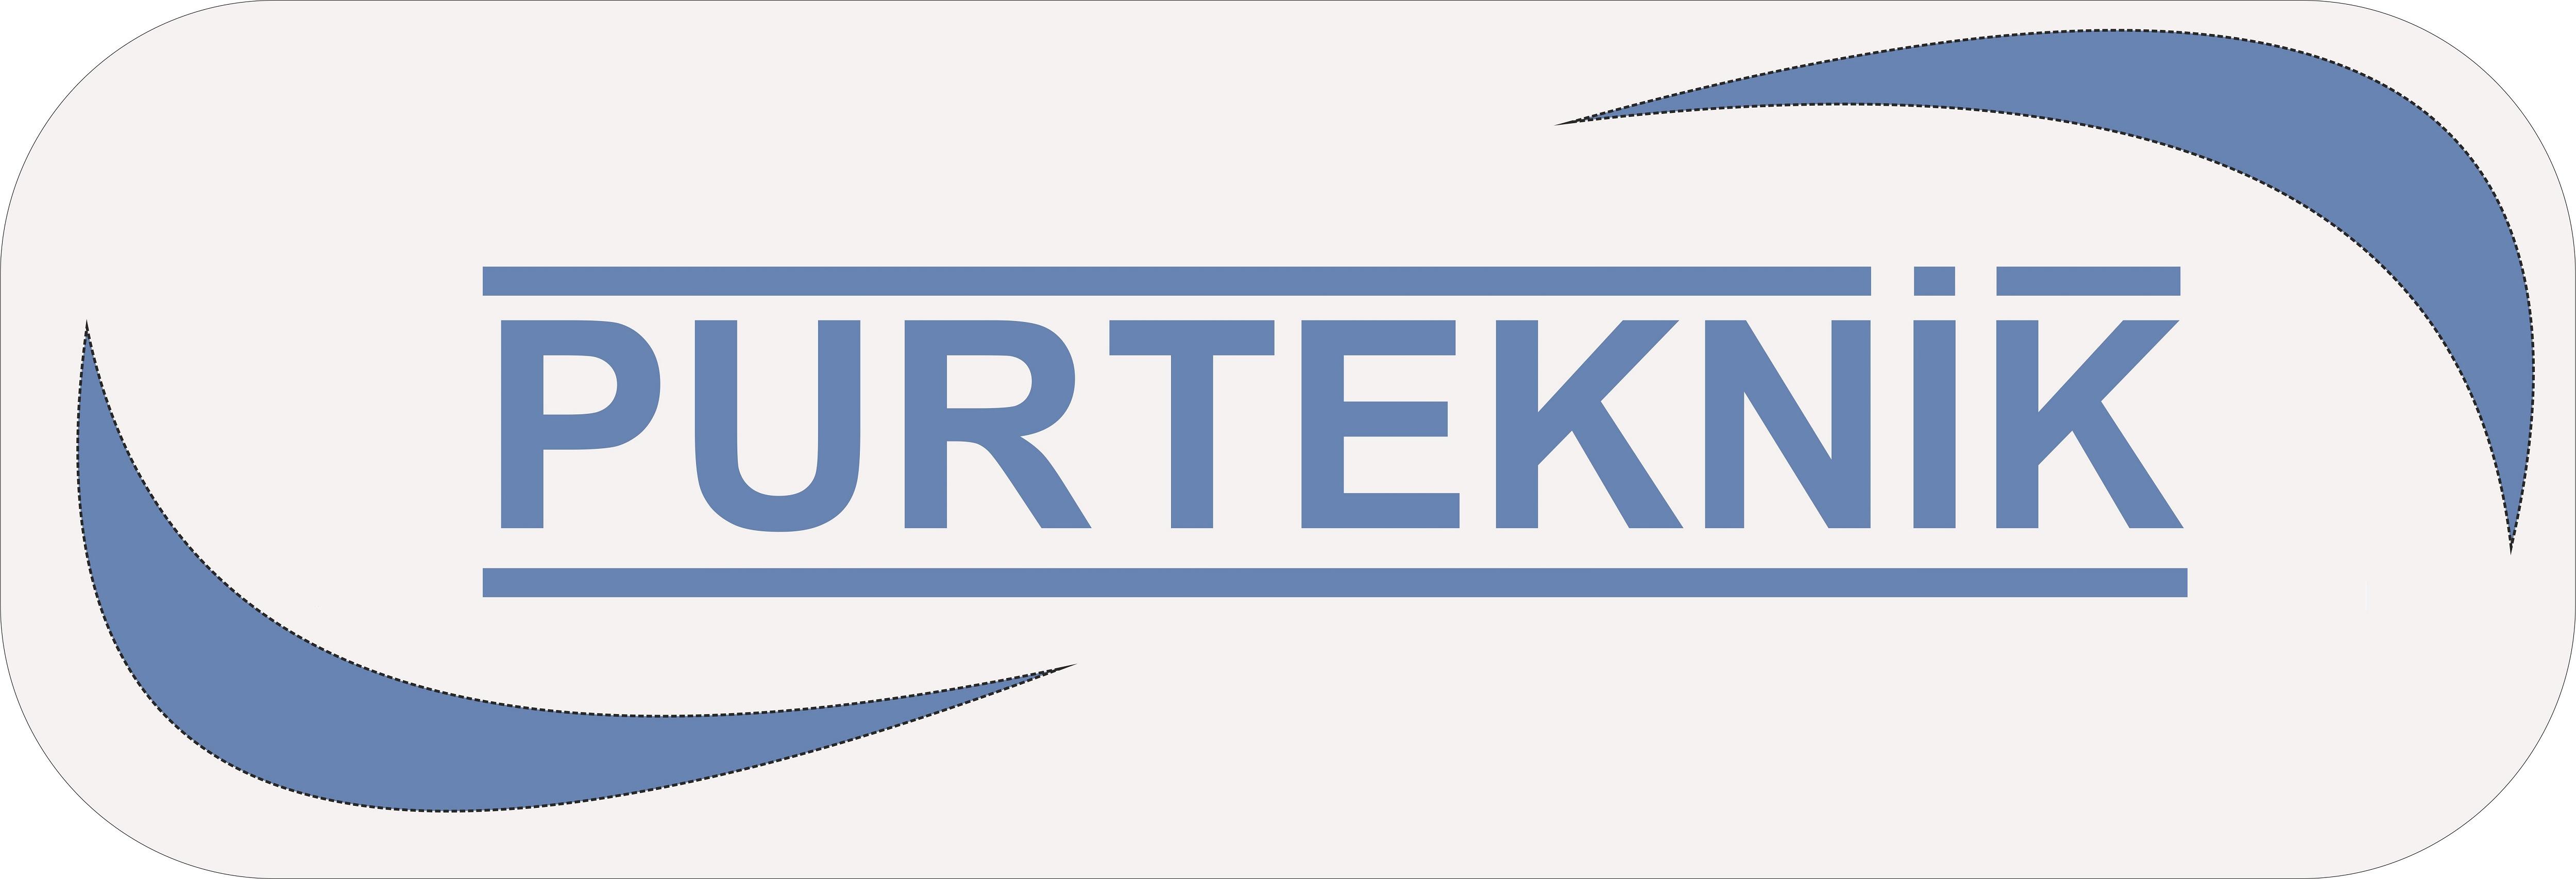 PURTEKNIK POLYURETHAN